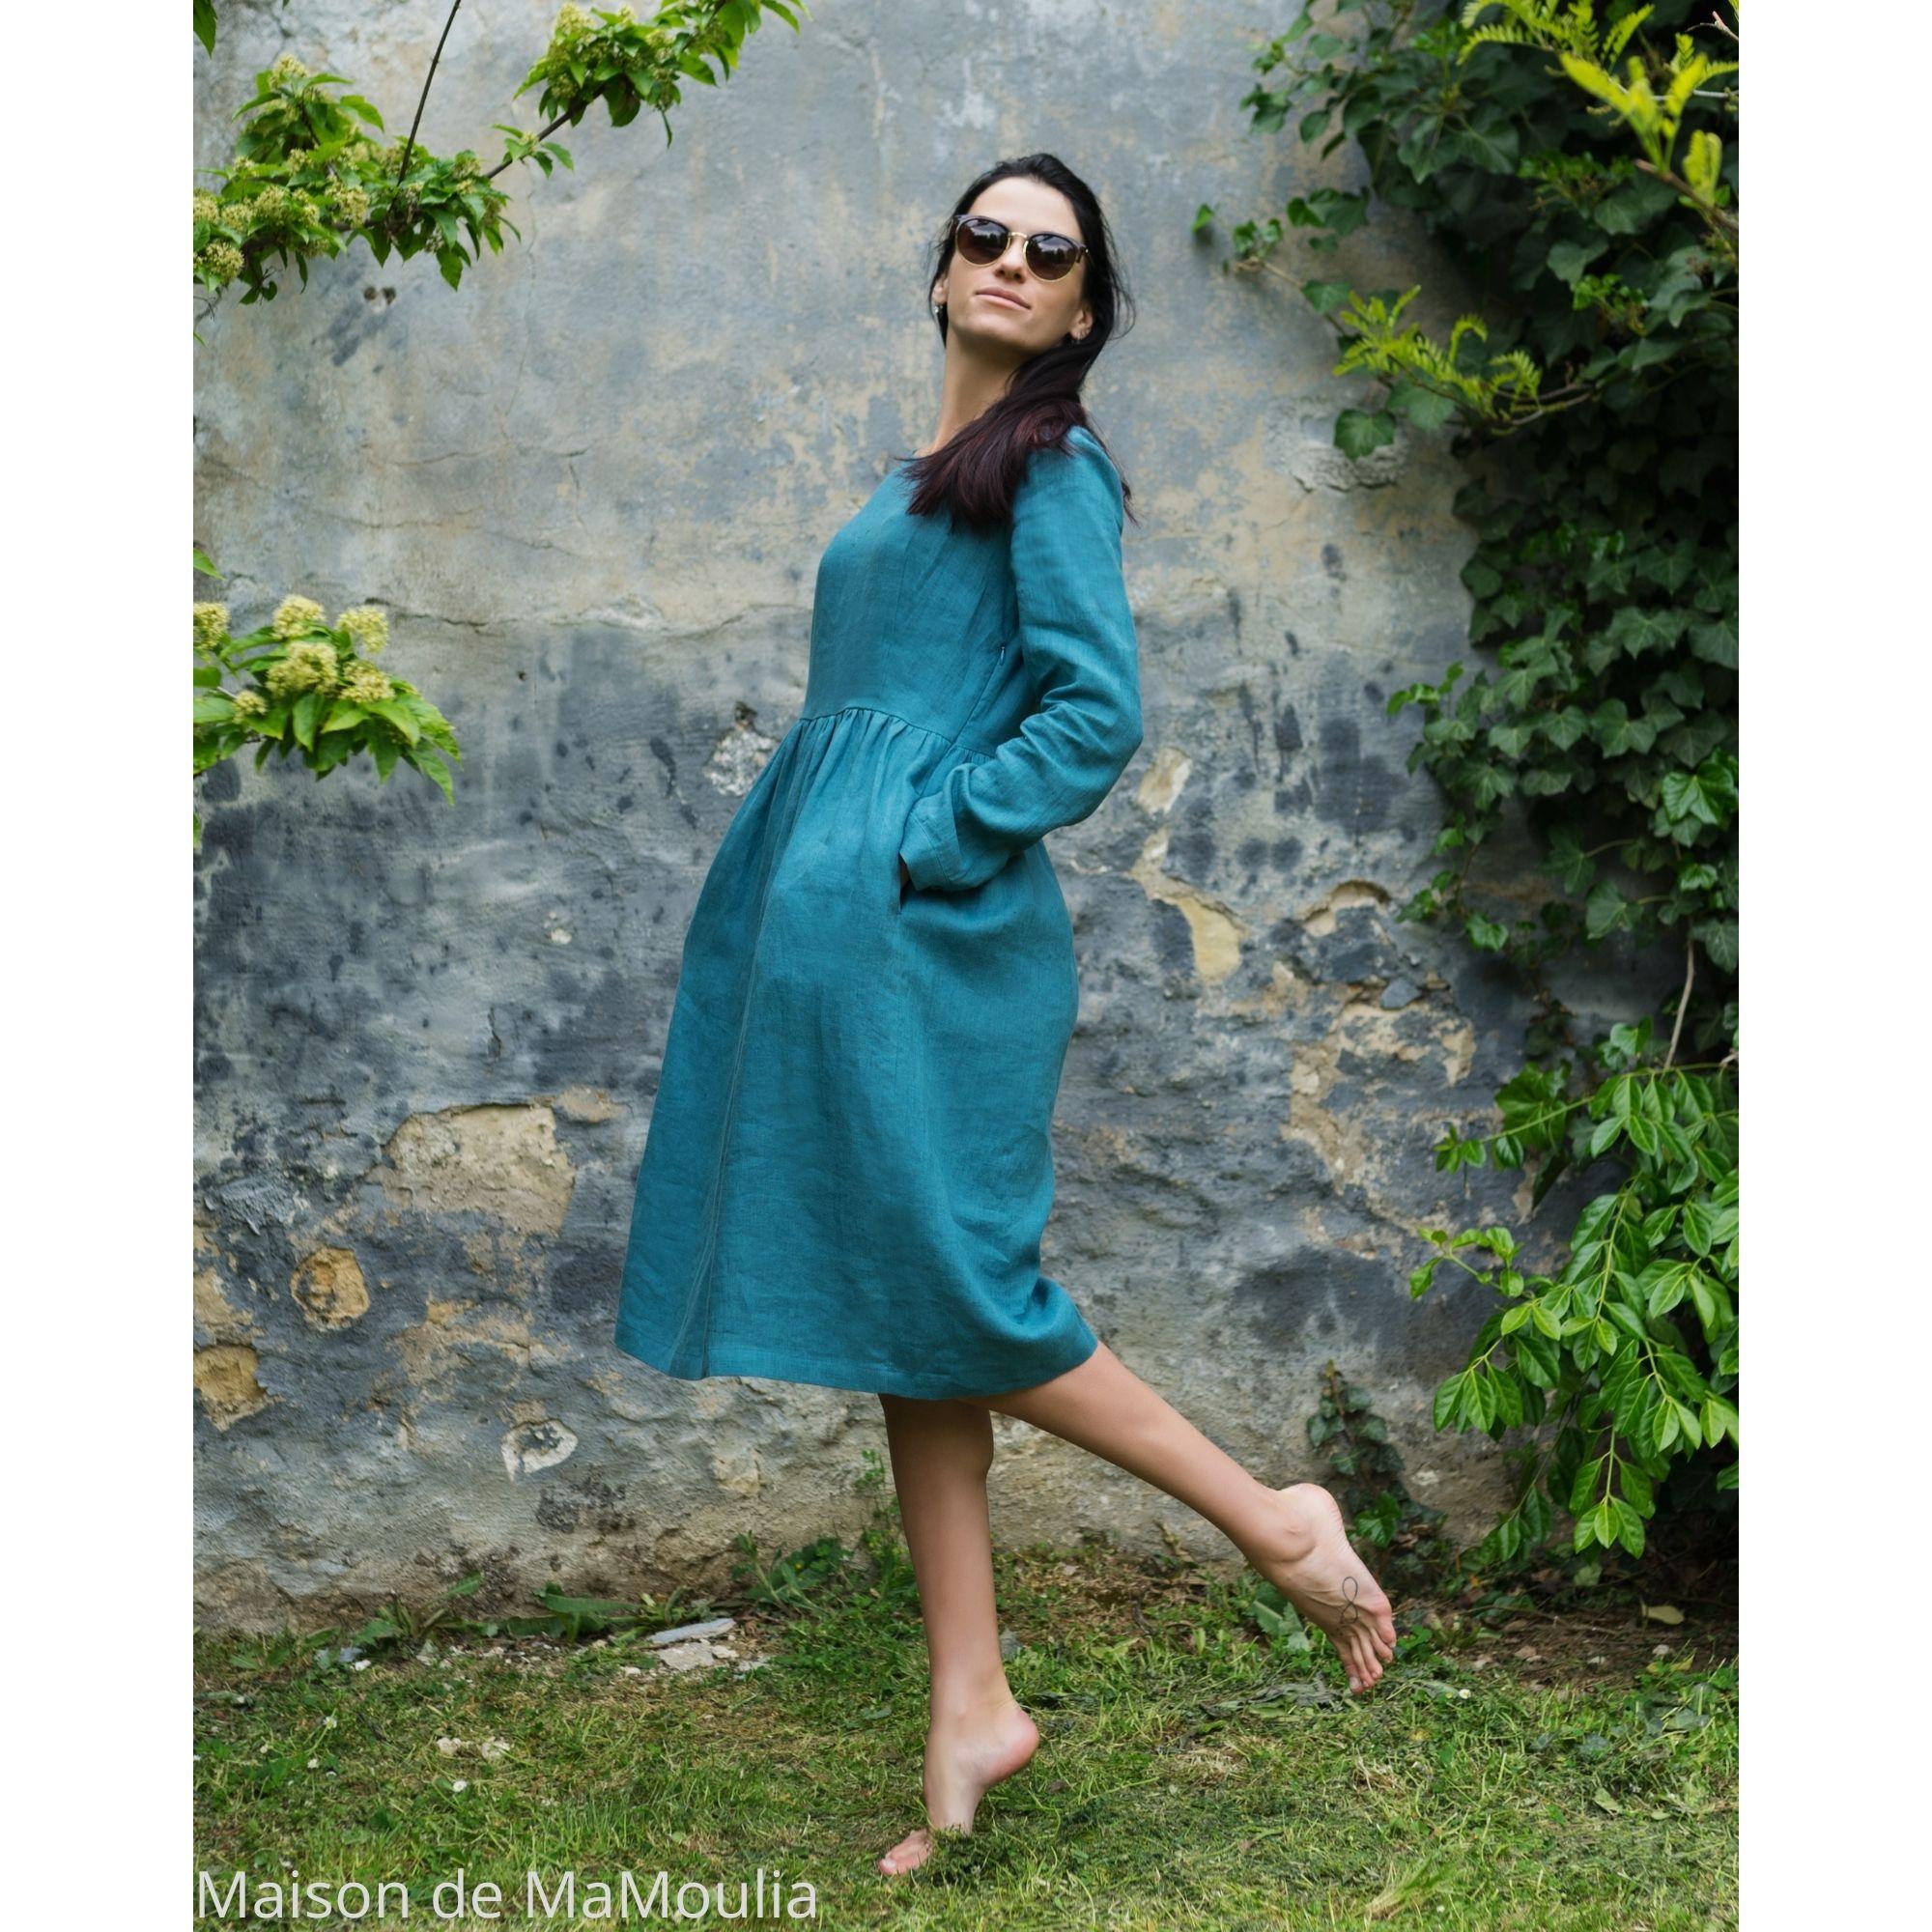 OFFON - Robe ajustée midi - 100% lin lavé - turquoise clair